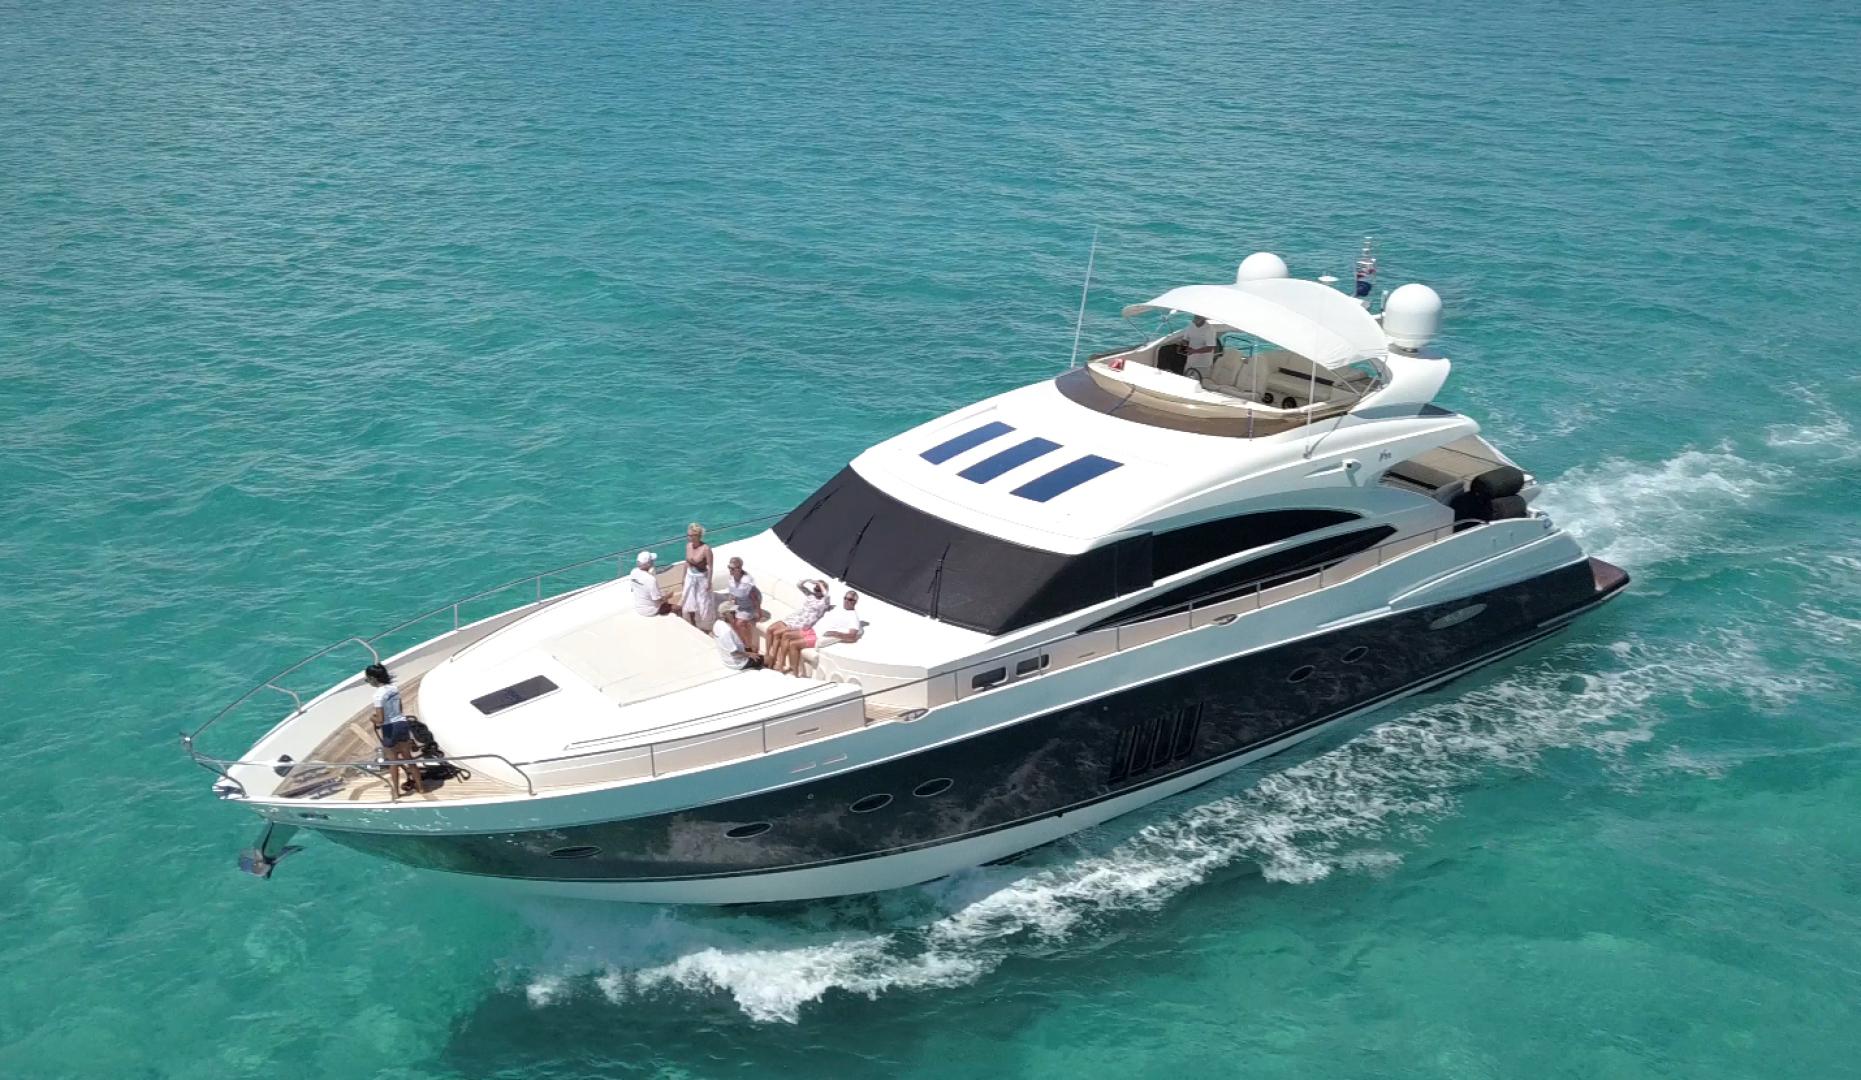 Viking Princess-V85 2009-Las Brisas Fort Lauderdale-Florida-United States-1365557 | Thumbnail